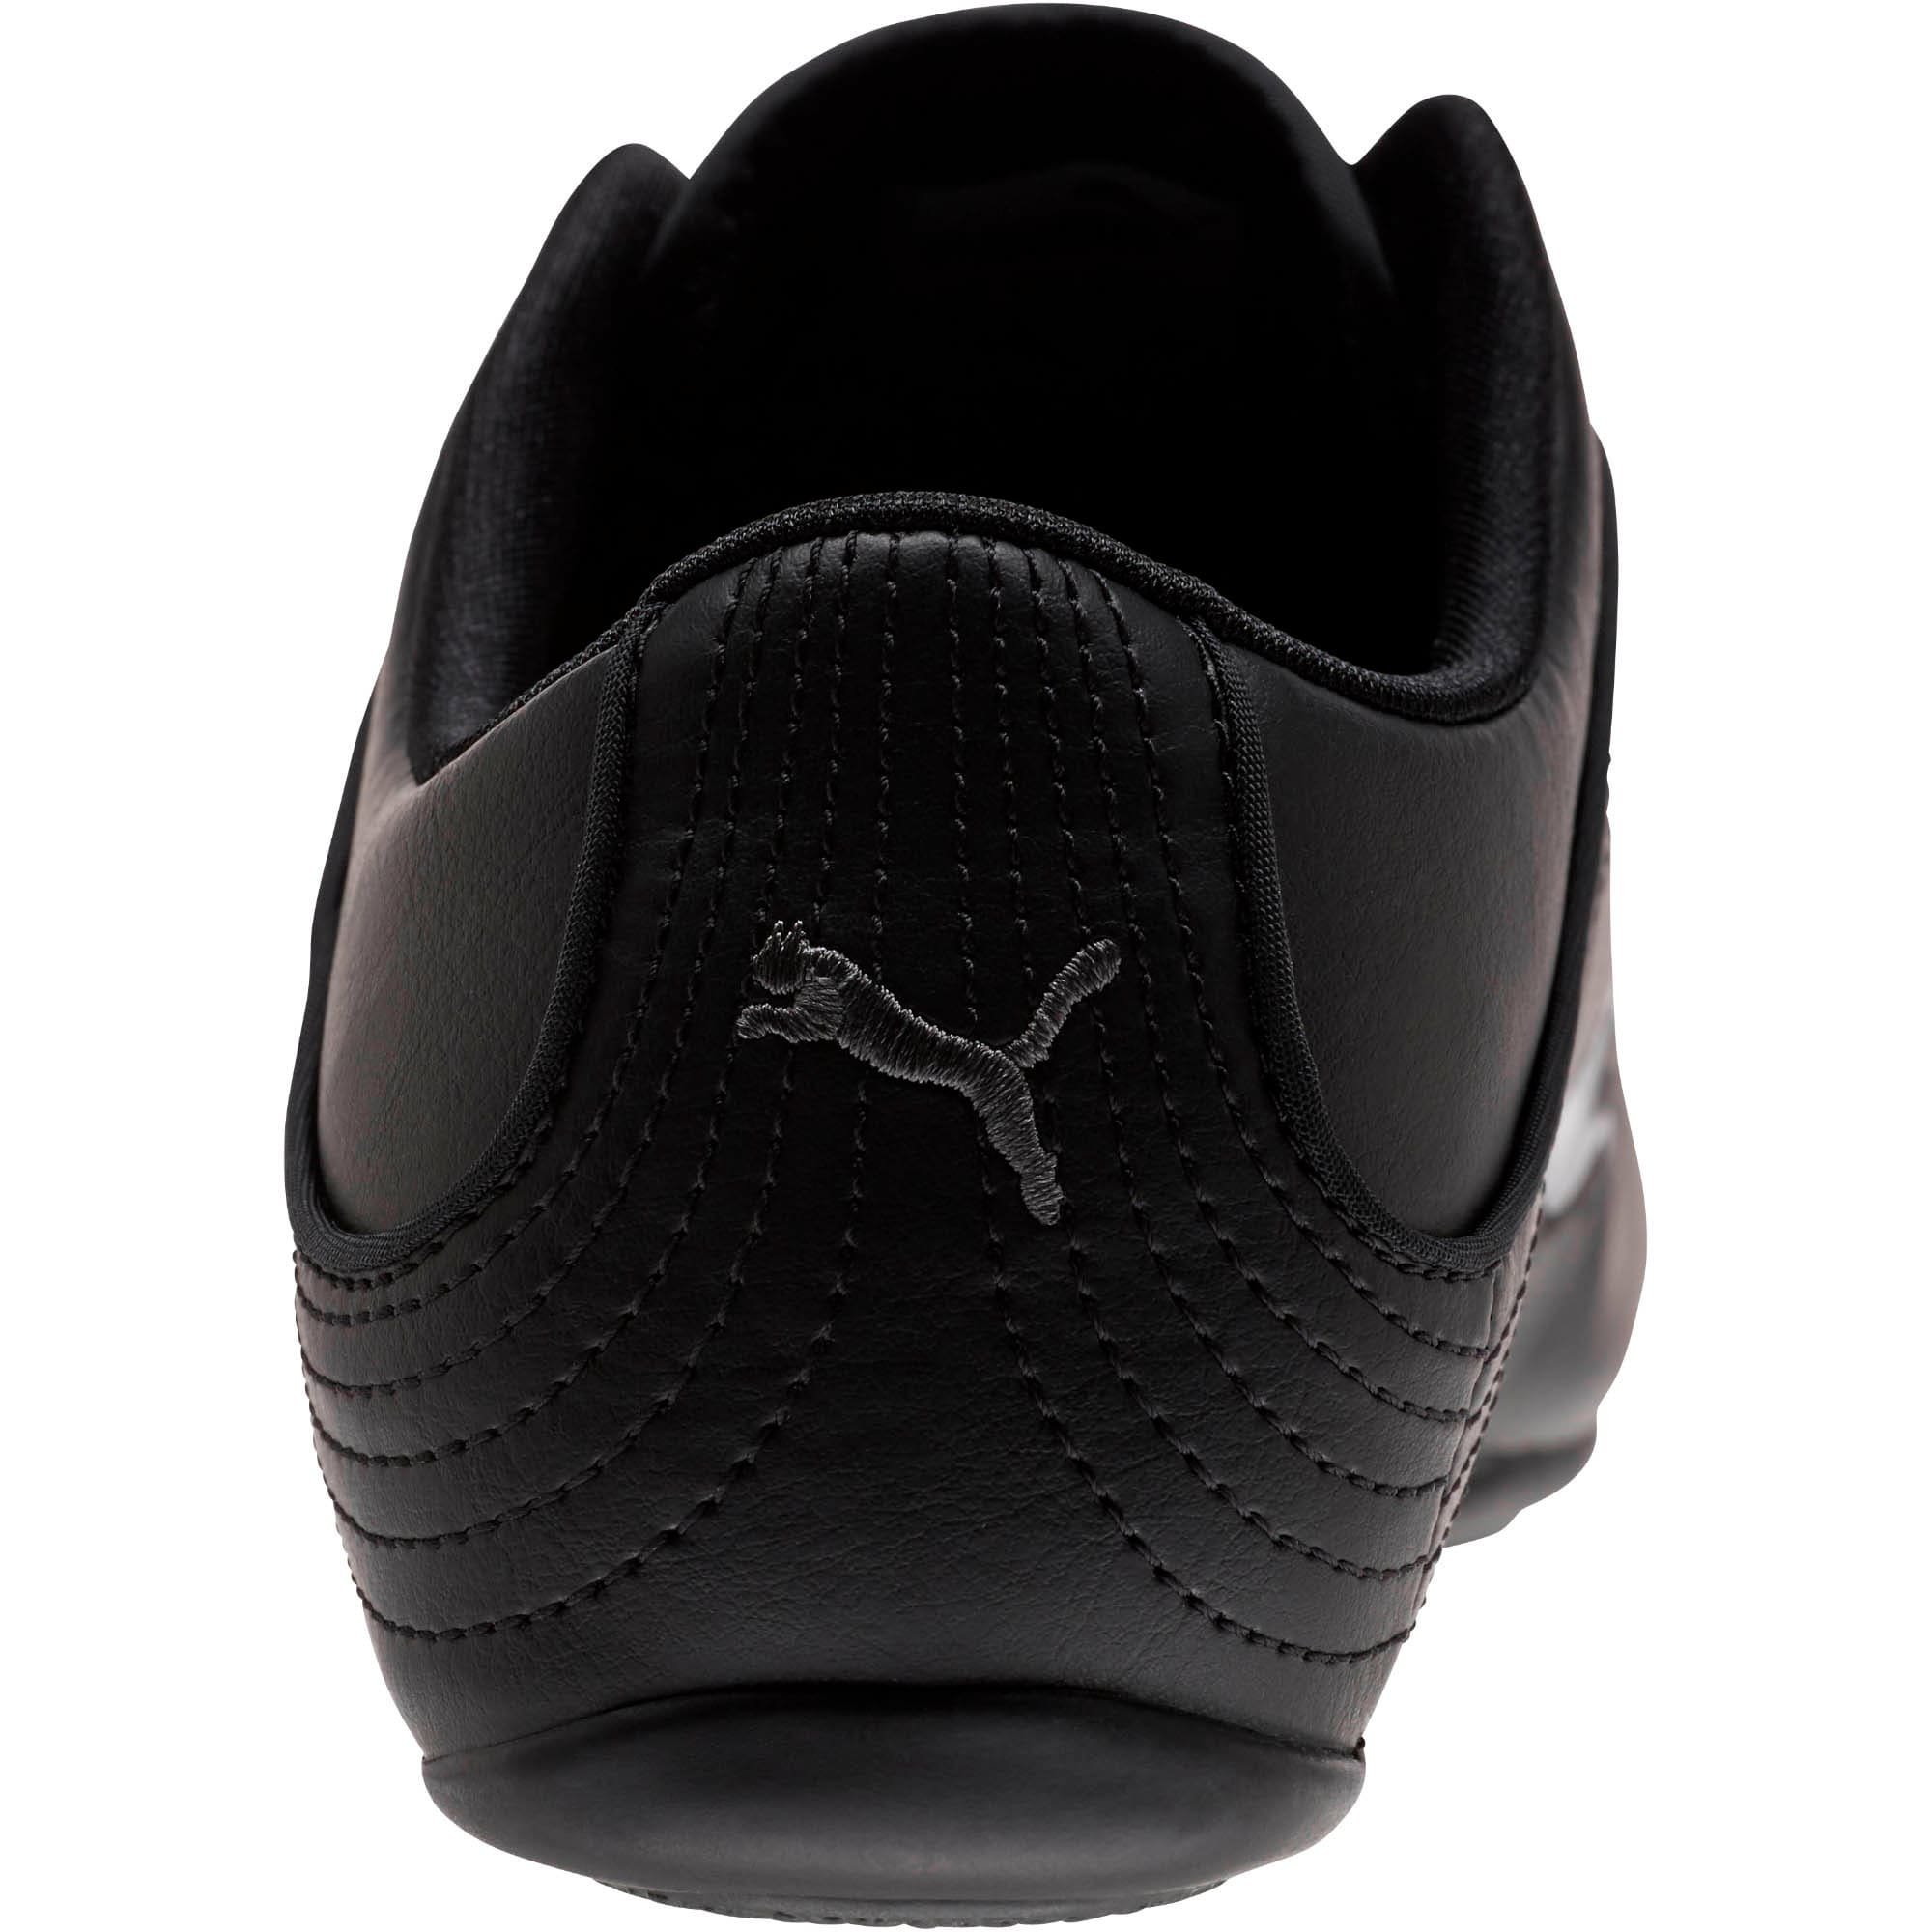 Thumbnail 3 of Soleil Cat Women's Shoes, black, medium